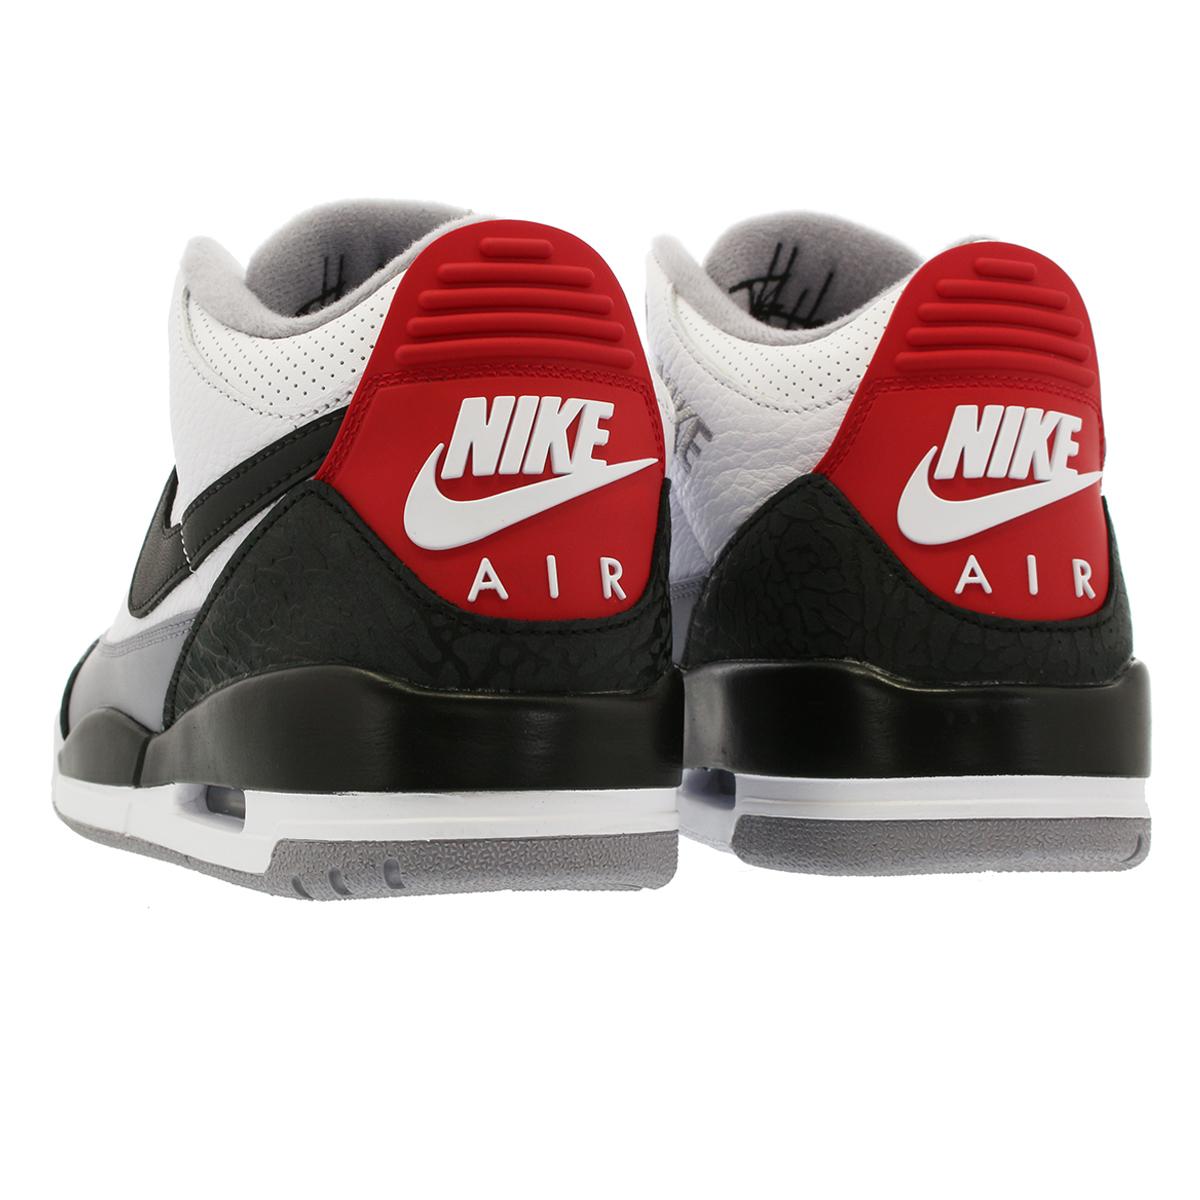 19ba848c8b0cbe NIKE AIR JORDAN 3 RETRO TINKER NRG Nike Air Jordan 3 レトロティンカー NRG WHITE FIRE  RED CEMENT GREY BLACK